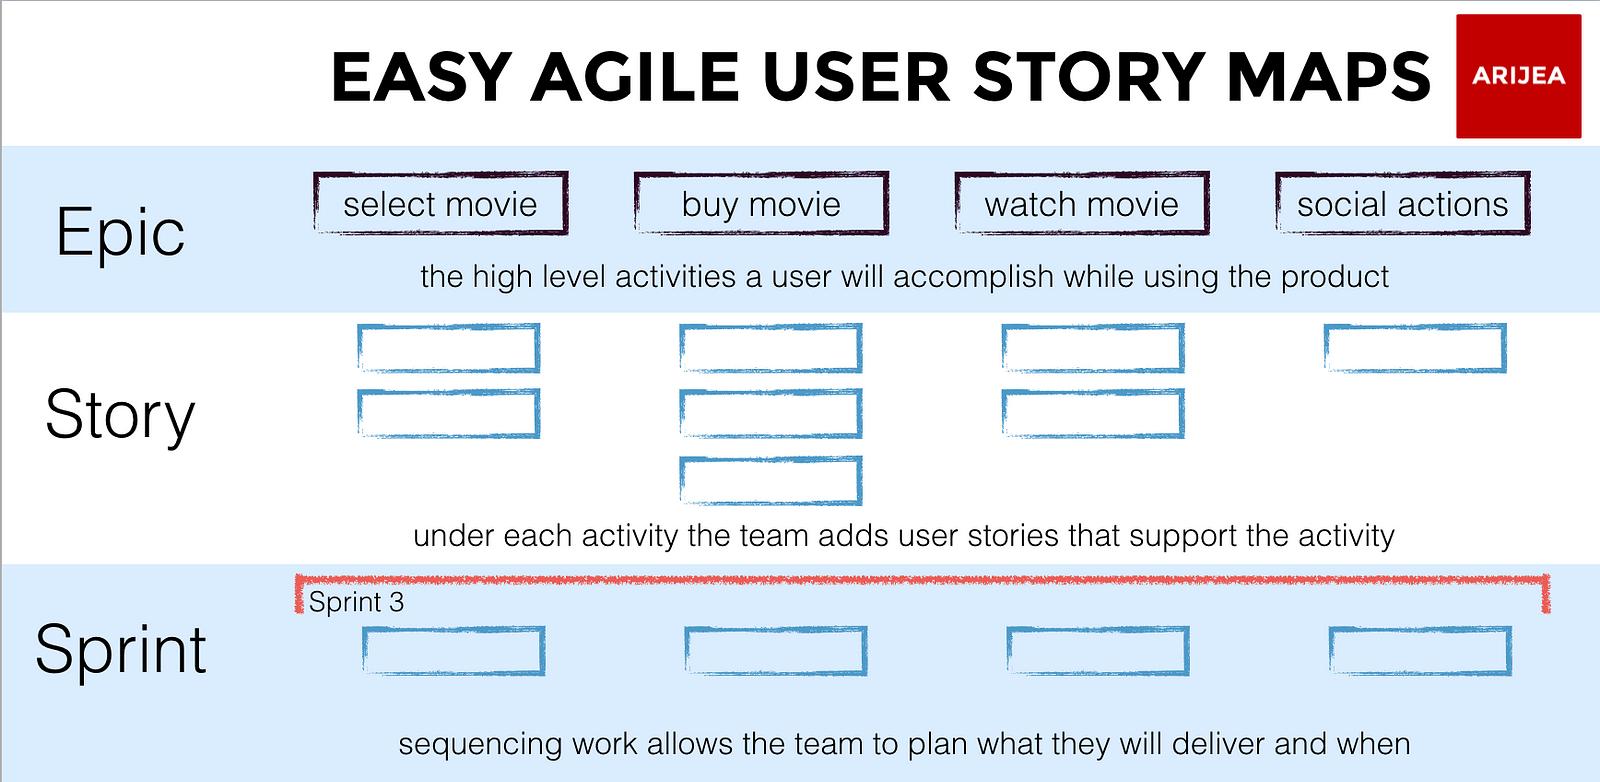 Anatomy Of An Agile User Story Map Easy Agile